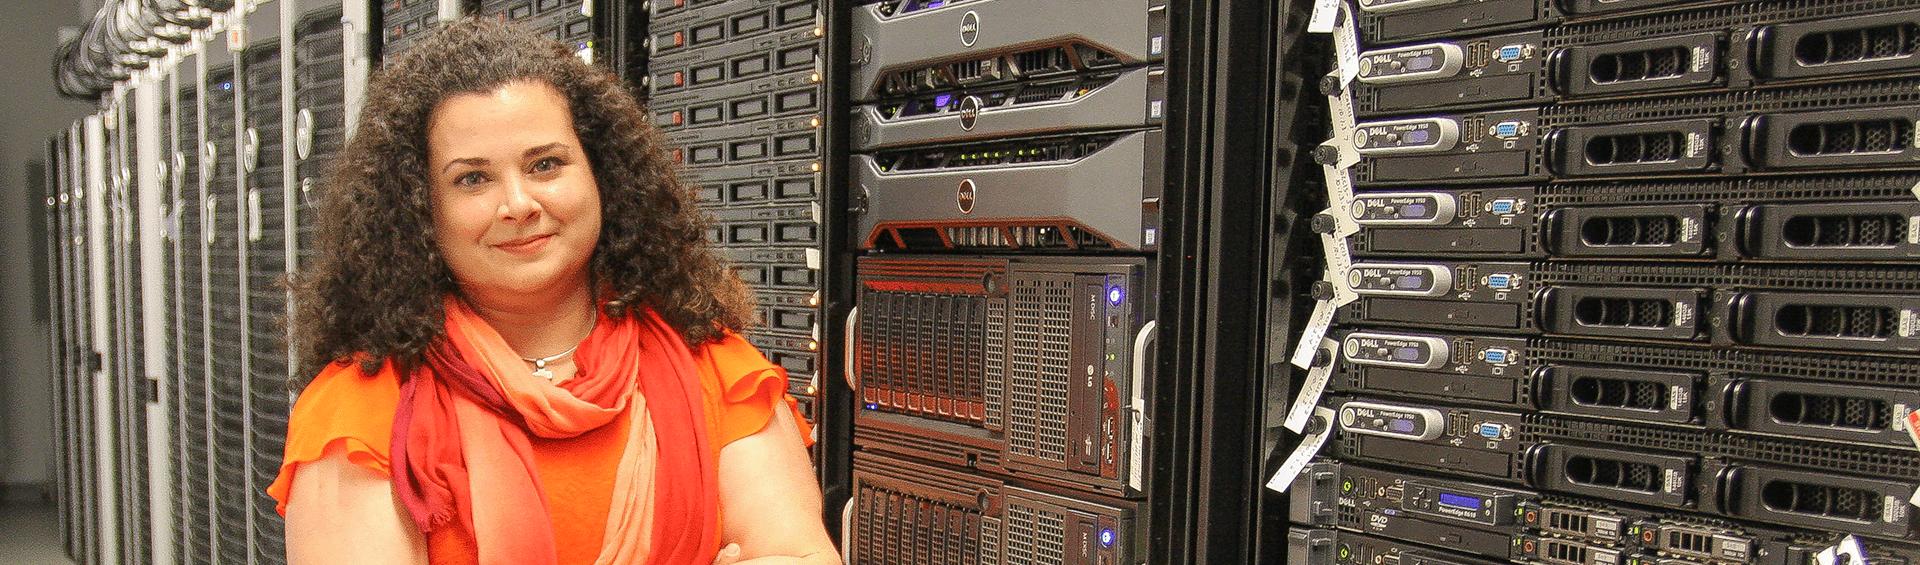 Christina Delimitrou: Designing resource-efficient datacenters